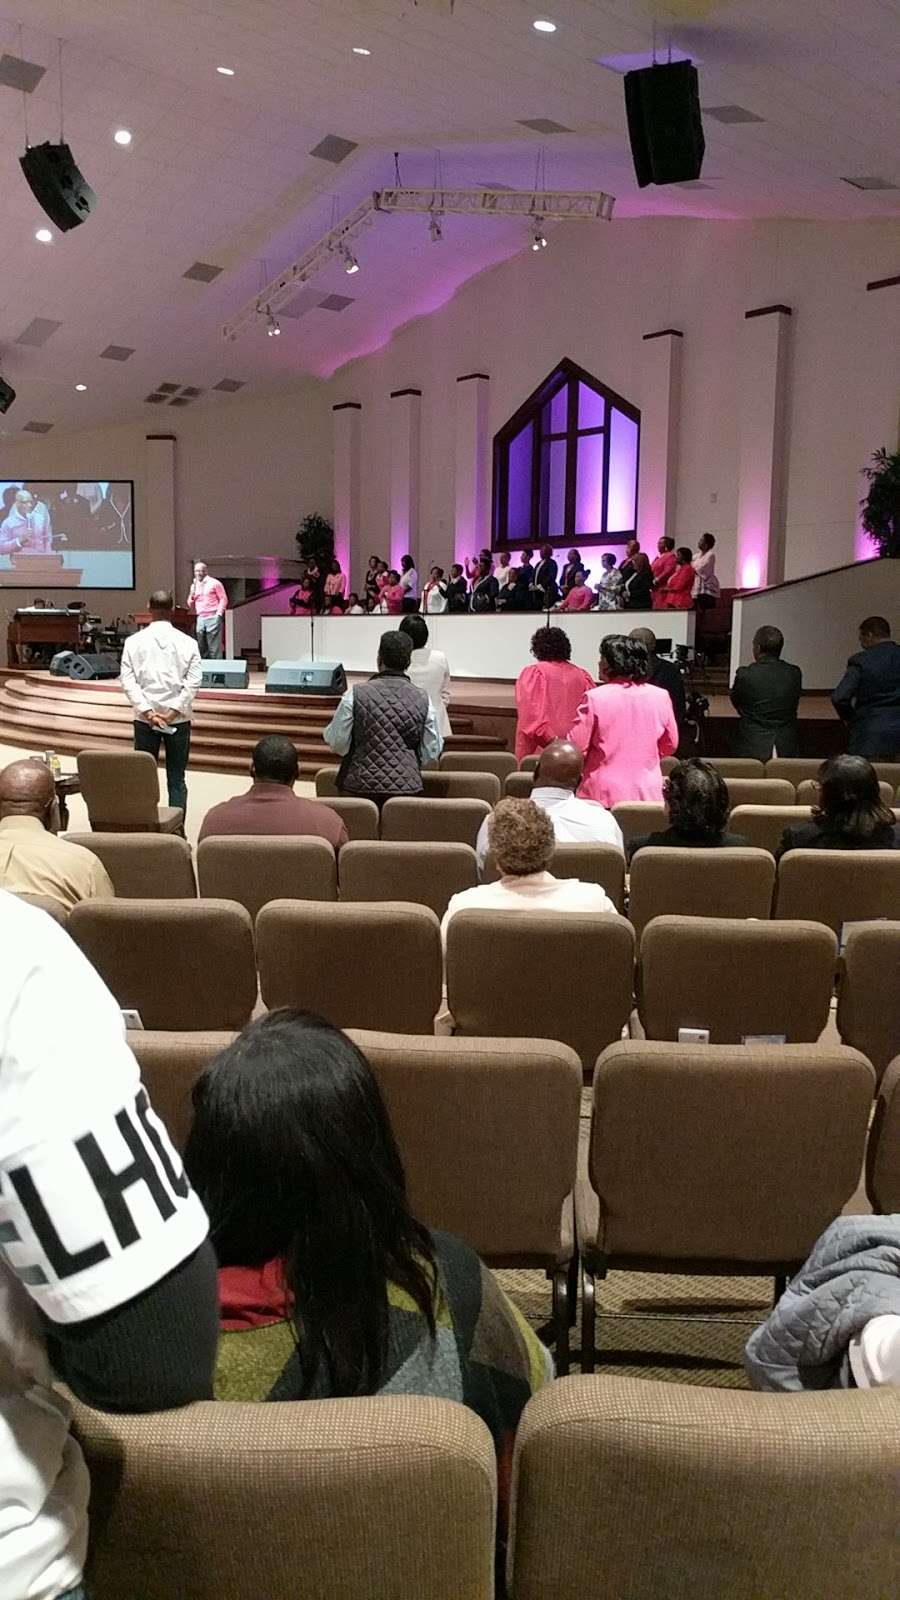 The Luke Church - church  | Photo 3 of 10 | Address: 2380 S Houston Ave, Humble, TX 77396, USA | Phone: (281) 548-2001